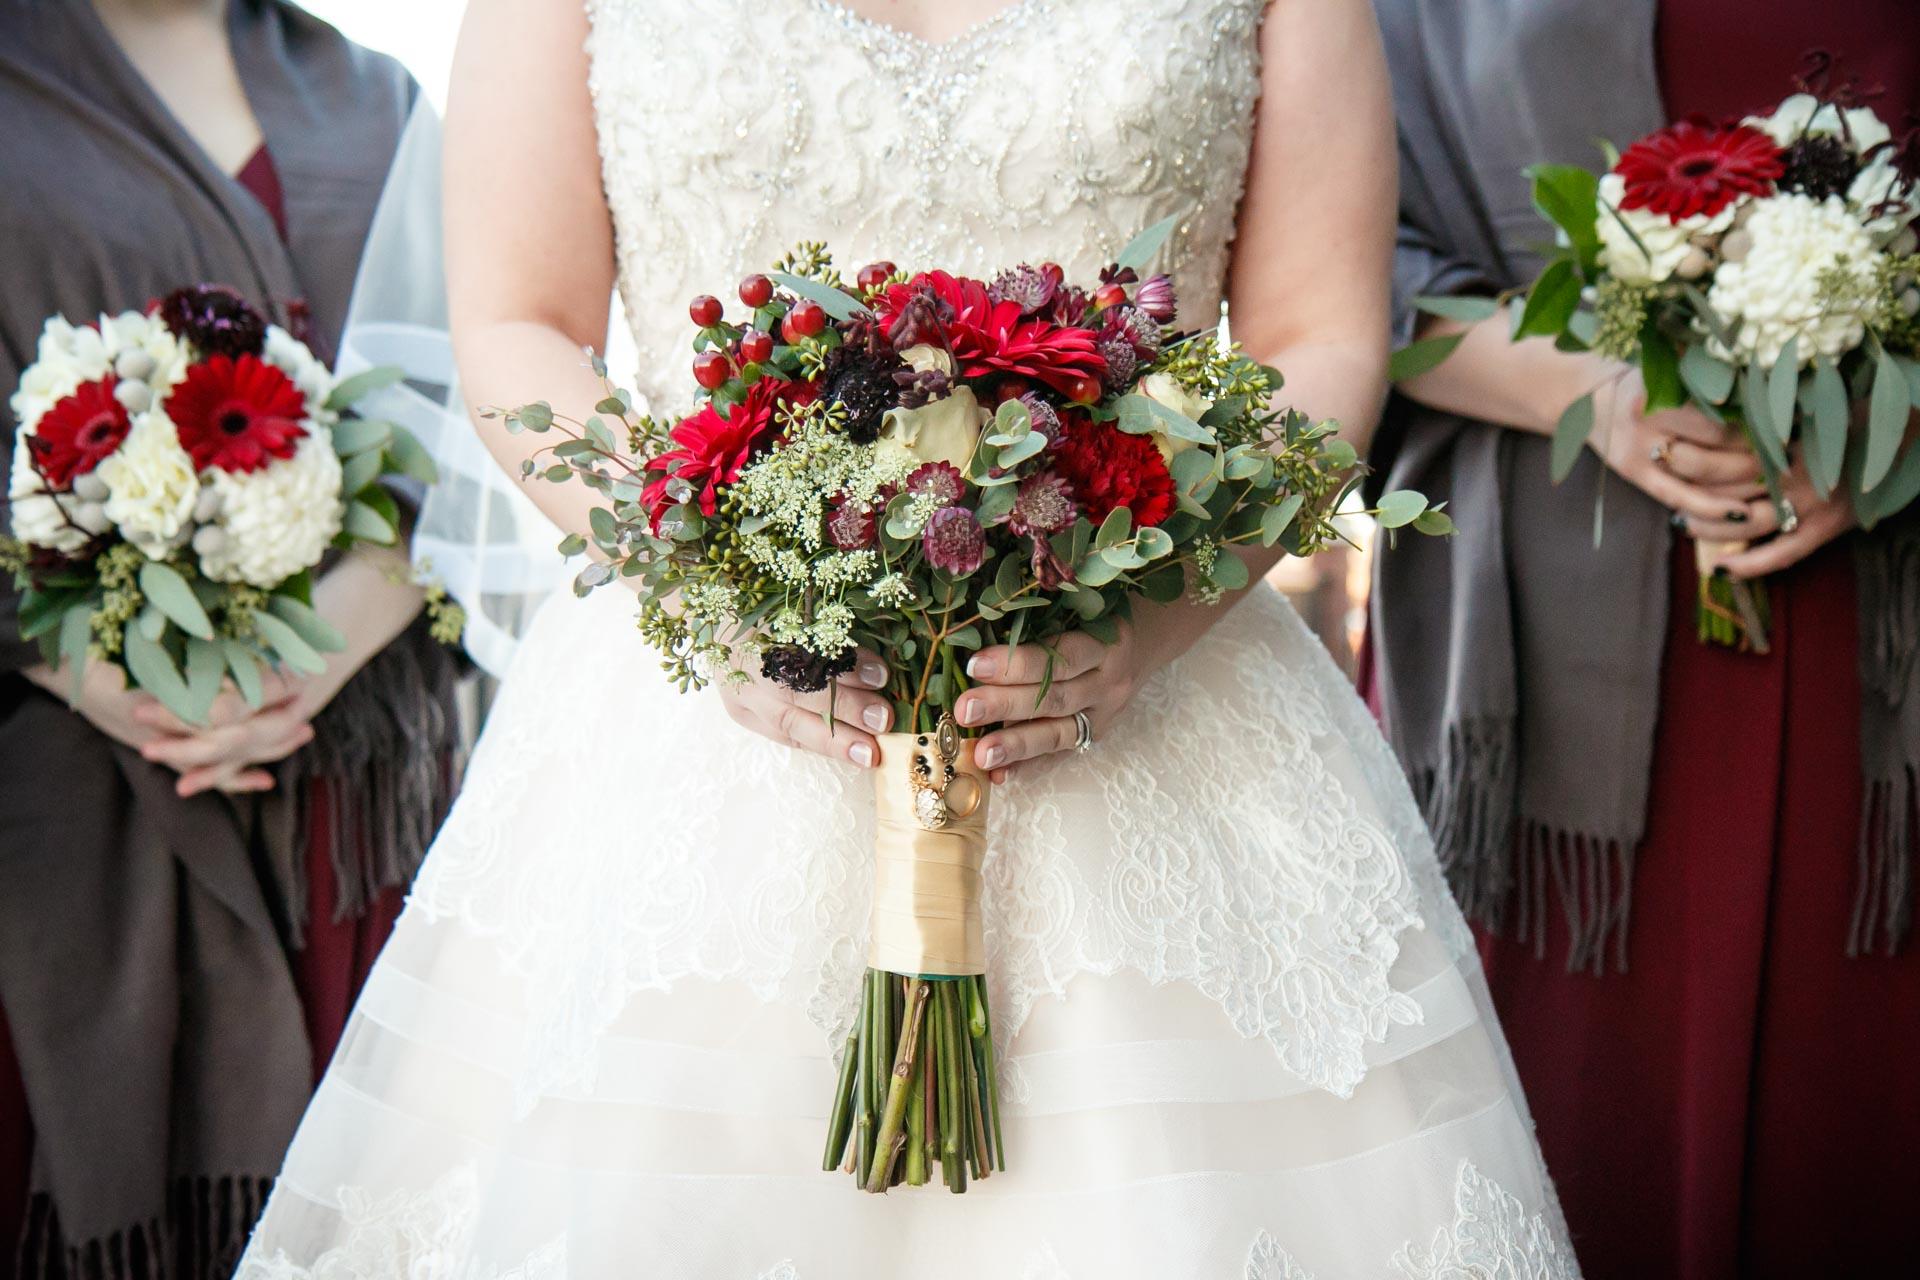 wedding-adam-shea-photography-green-bay-appleton-neenah-photographer-23.jpg